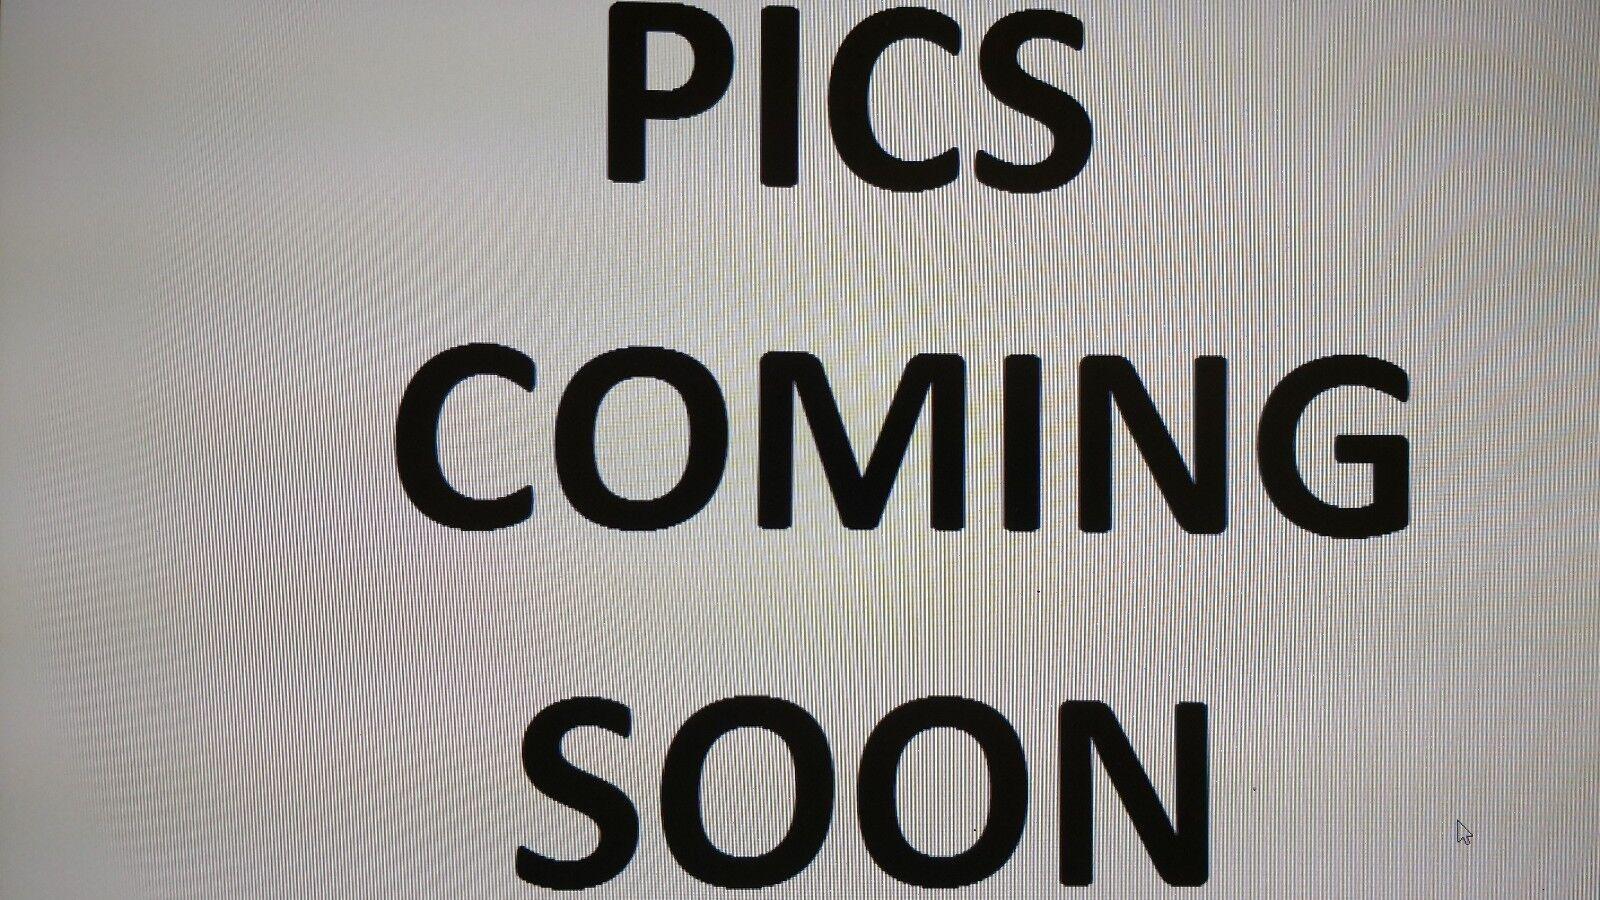 ADIDAS CRAZYQUICK 3 MEN'S BASKETBALL D69525 BLACK SCARLET WHITE D69525 SZ 17 ANB